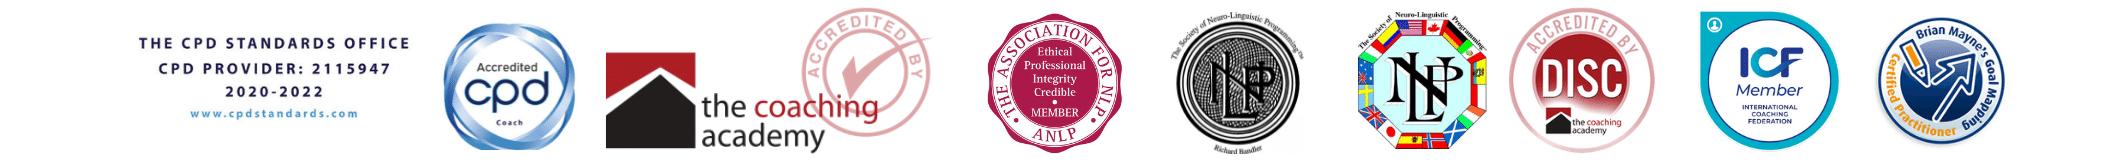 Accreditations held by Dr Eva Mantzourani